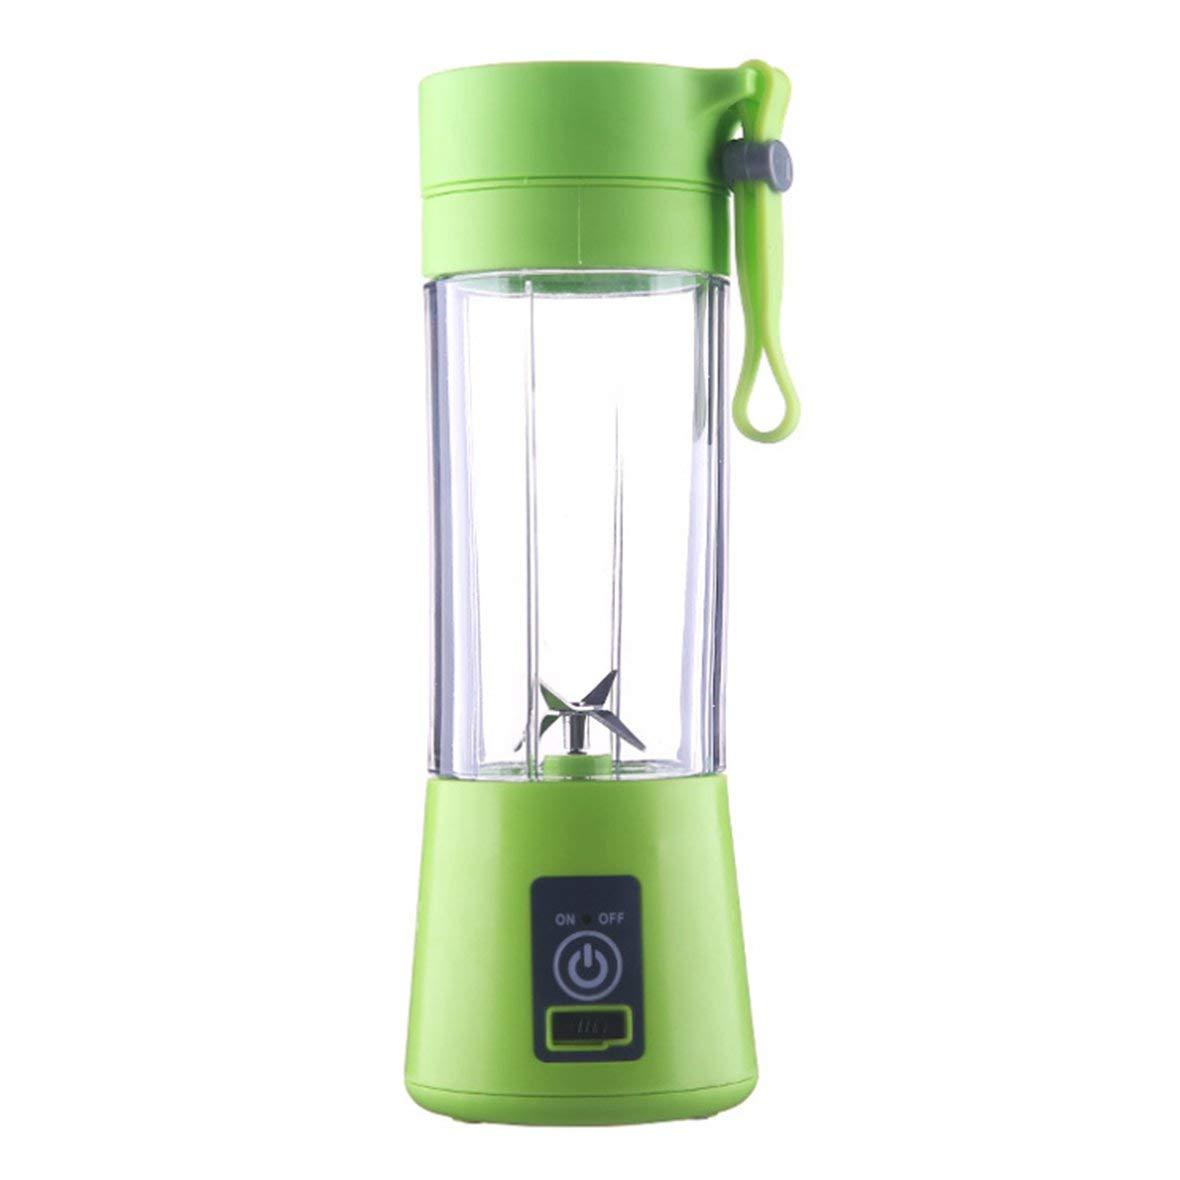 Color:Green Size:4 Blades 2//4 Blades Mini USB Rechargeable Portable Electric Fruit Juicer Smoothie Maker Blender Machine Sports Bottle Juicing Cup/&